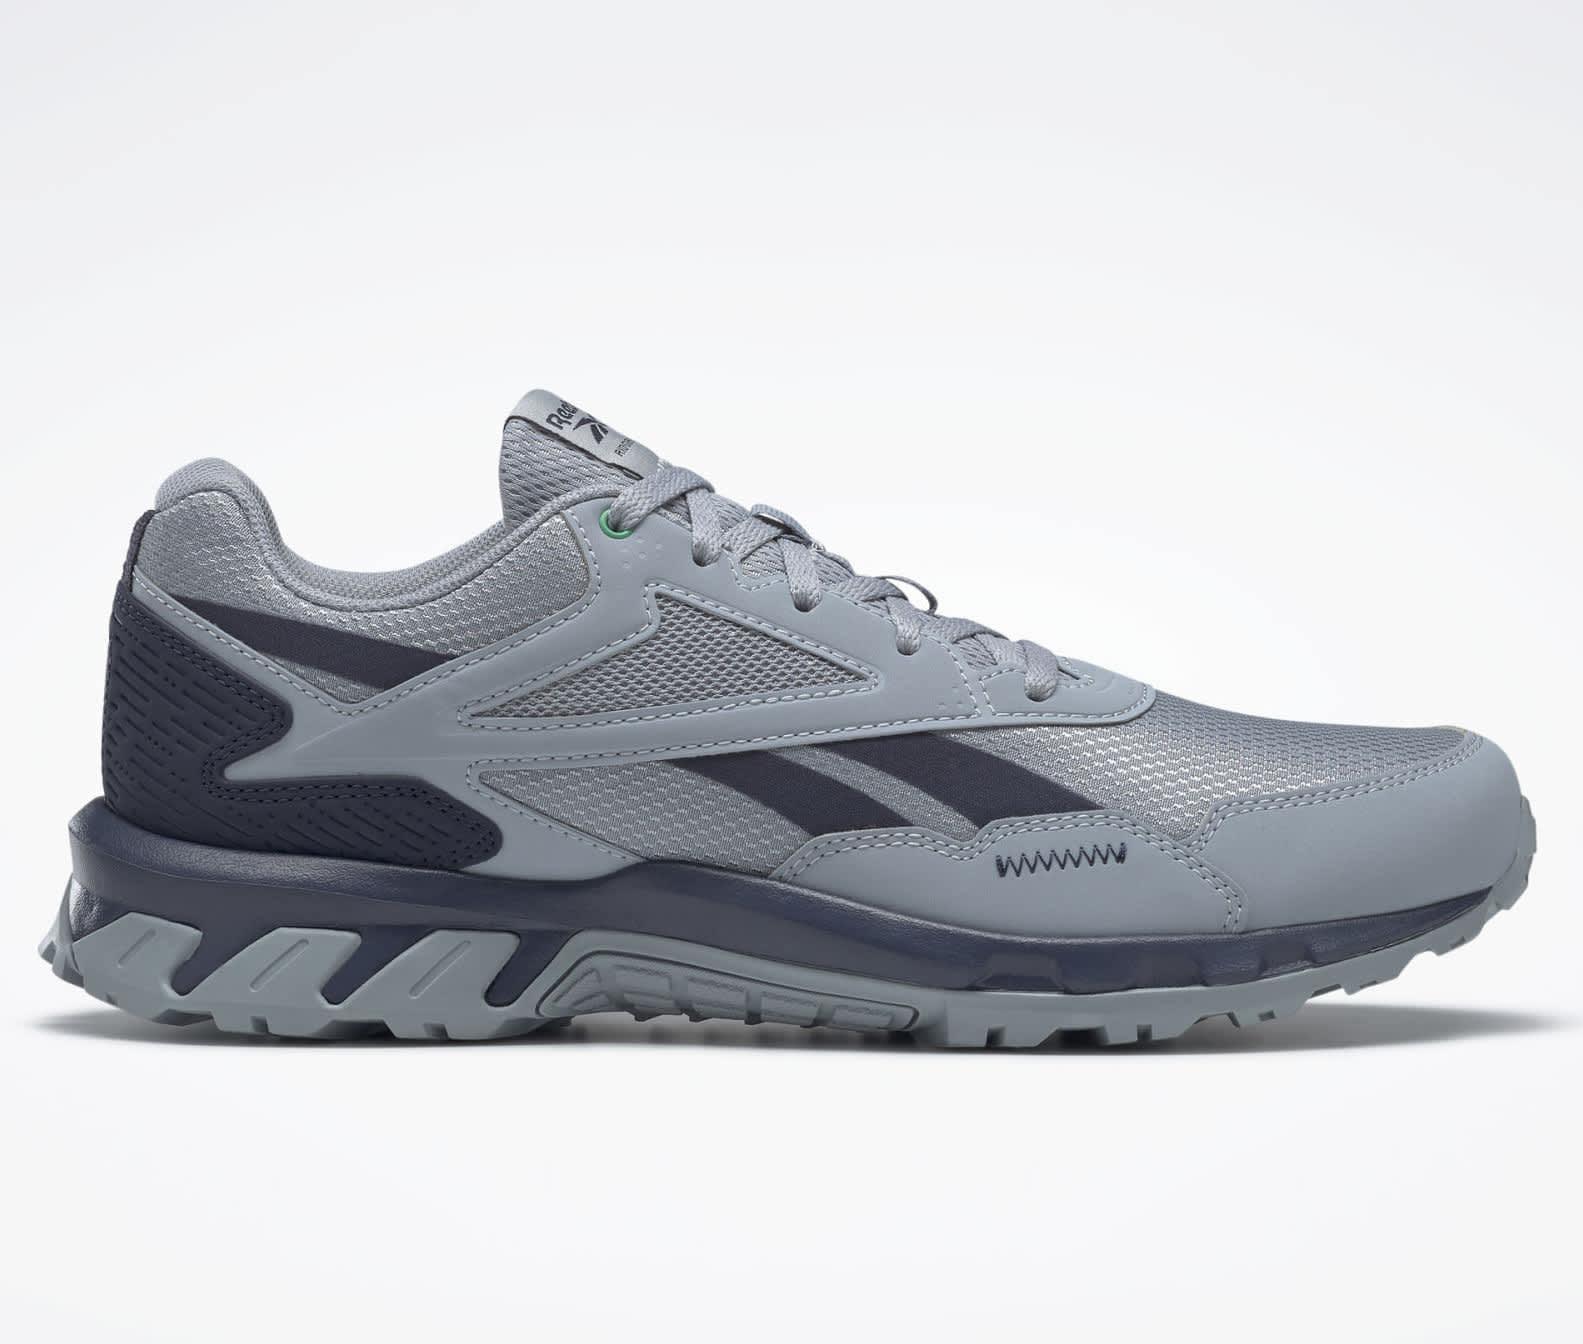 Reebok Men's Ridgerider 5 Shoes